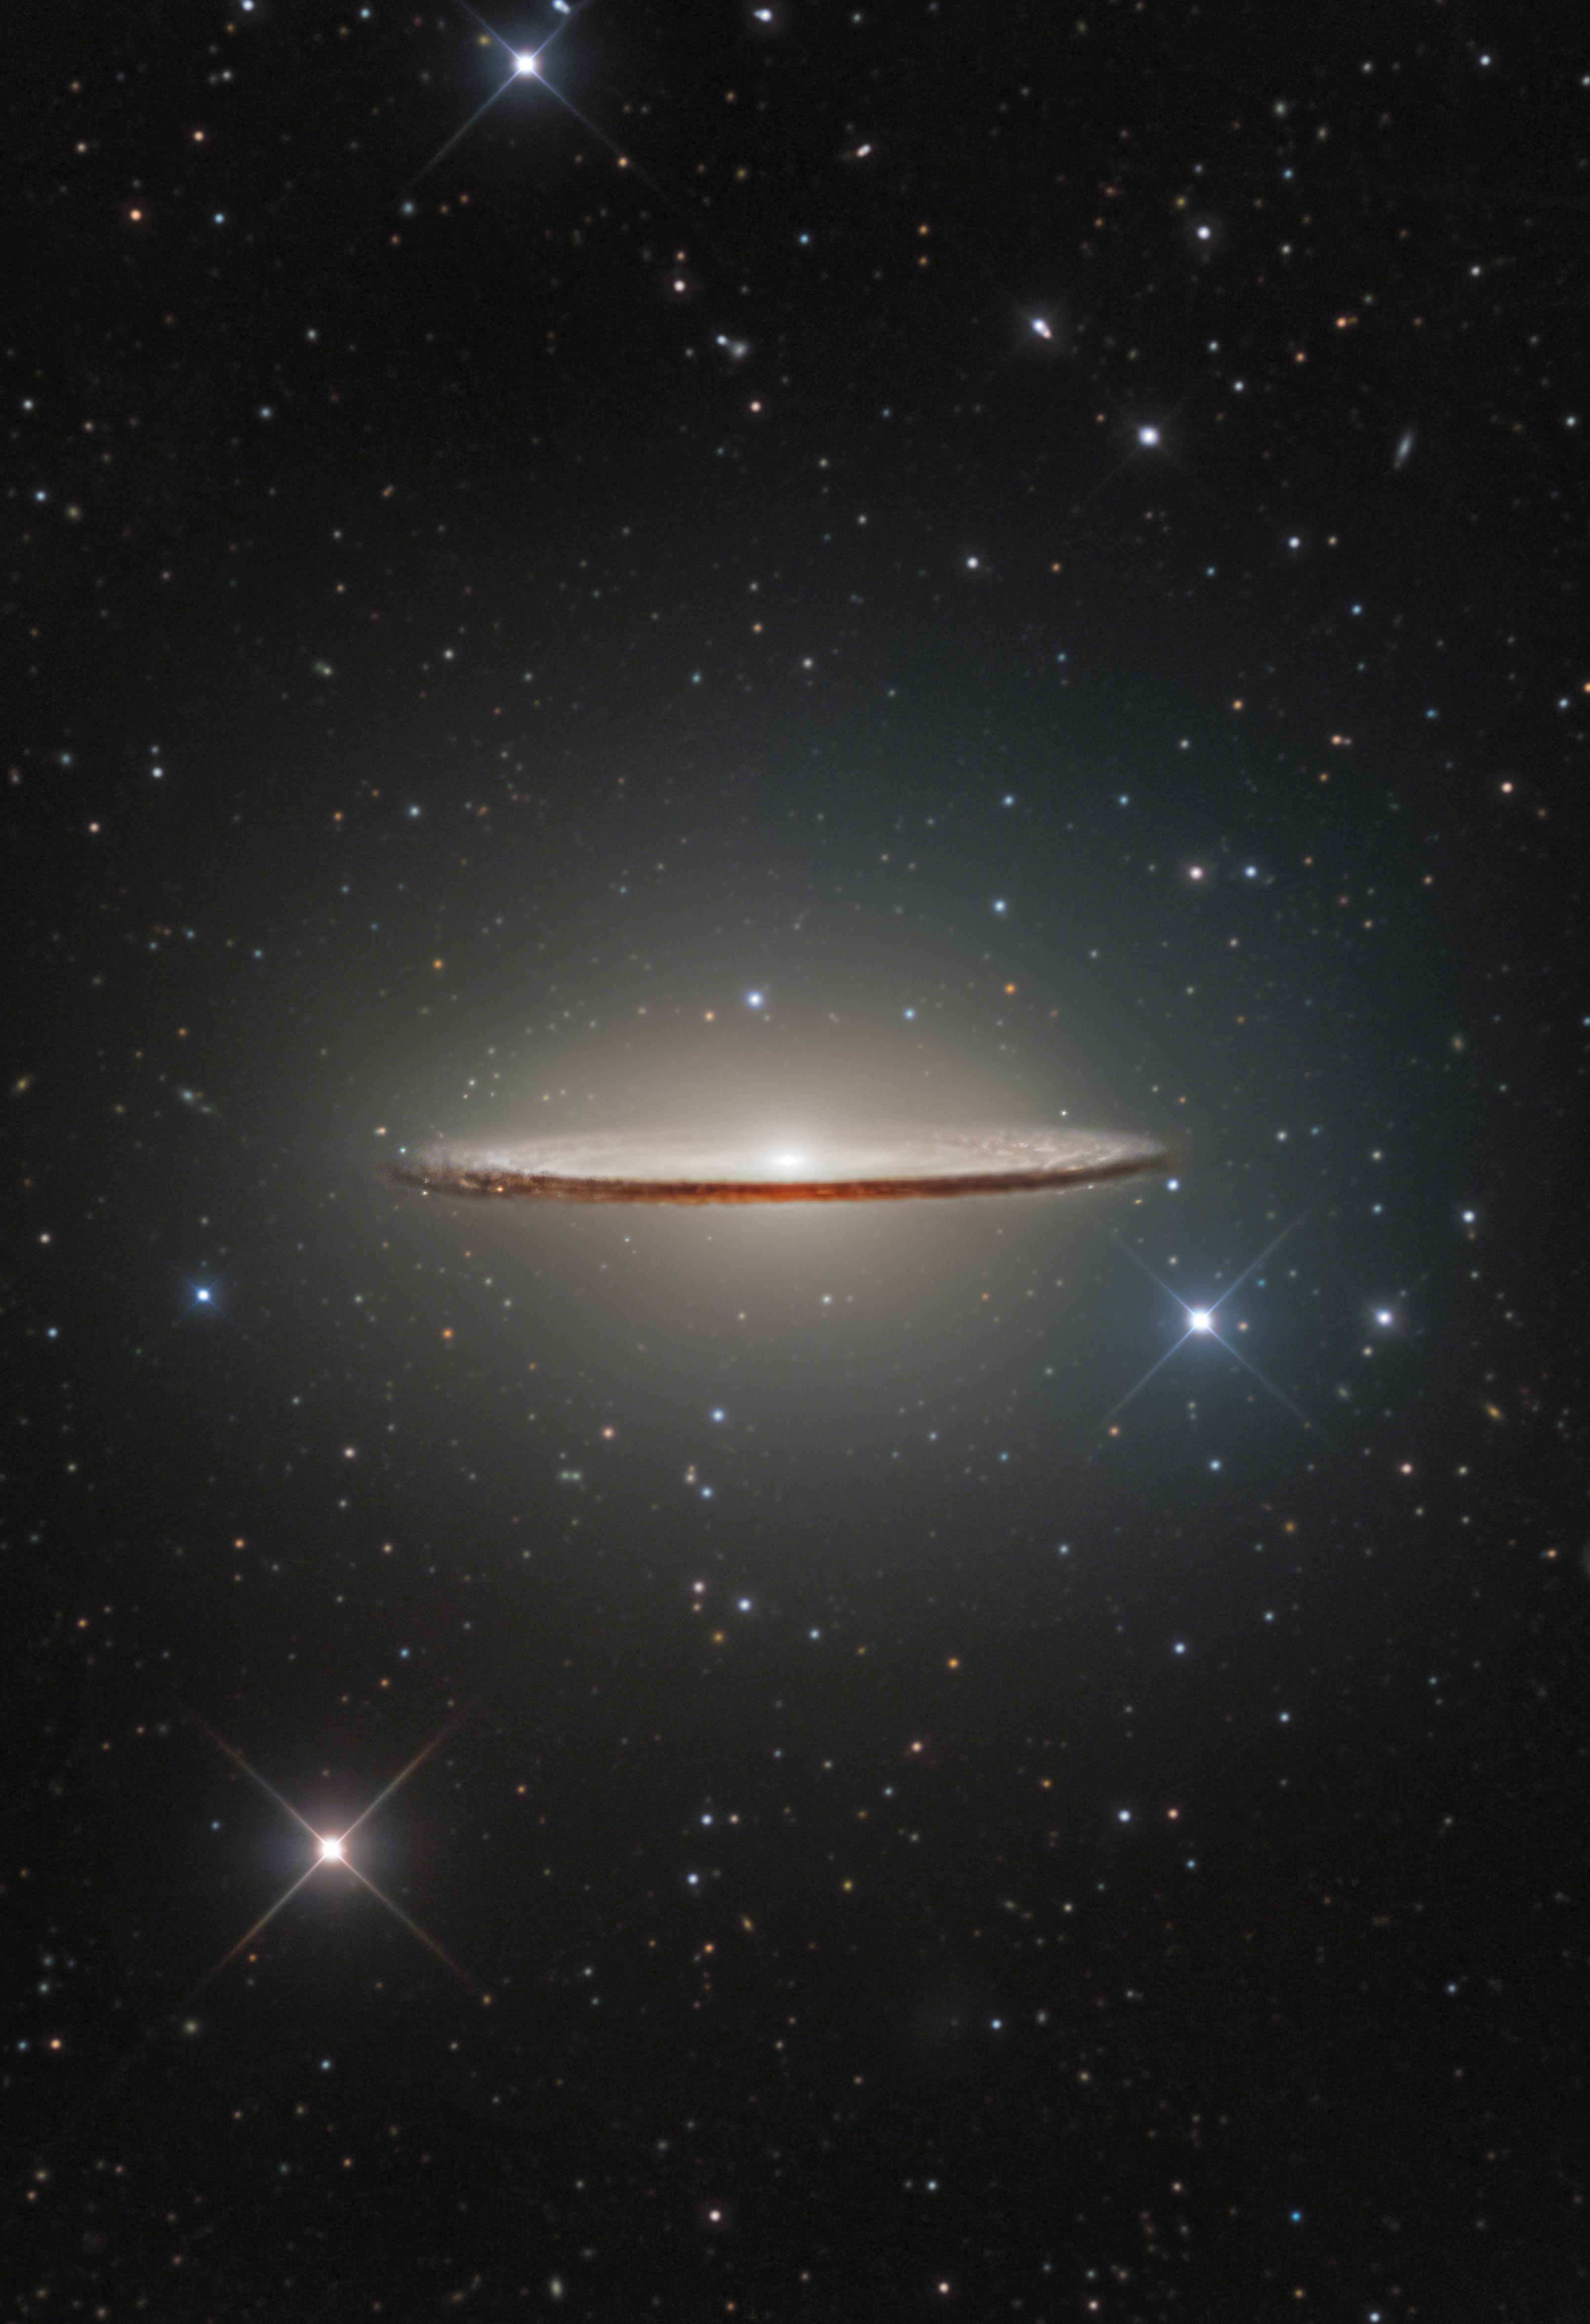 M104: The Sombrero Galaxy